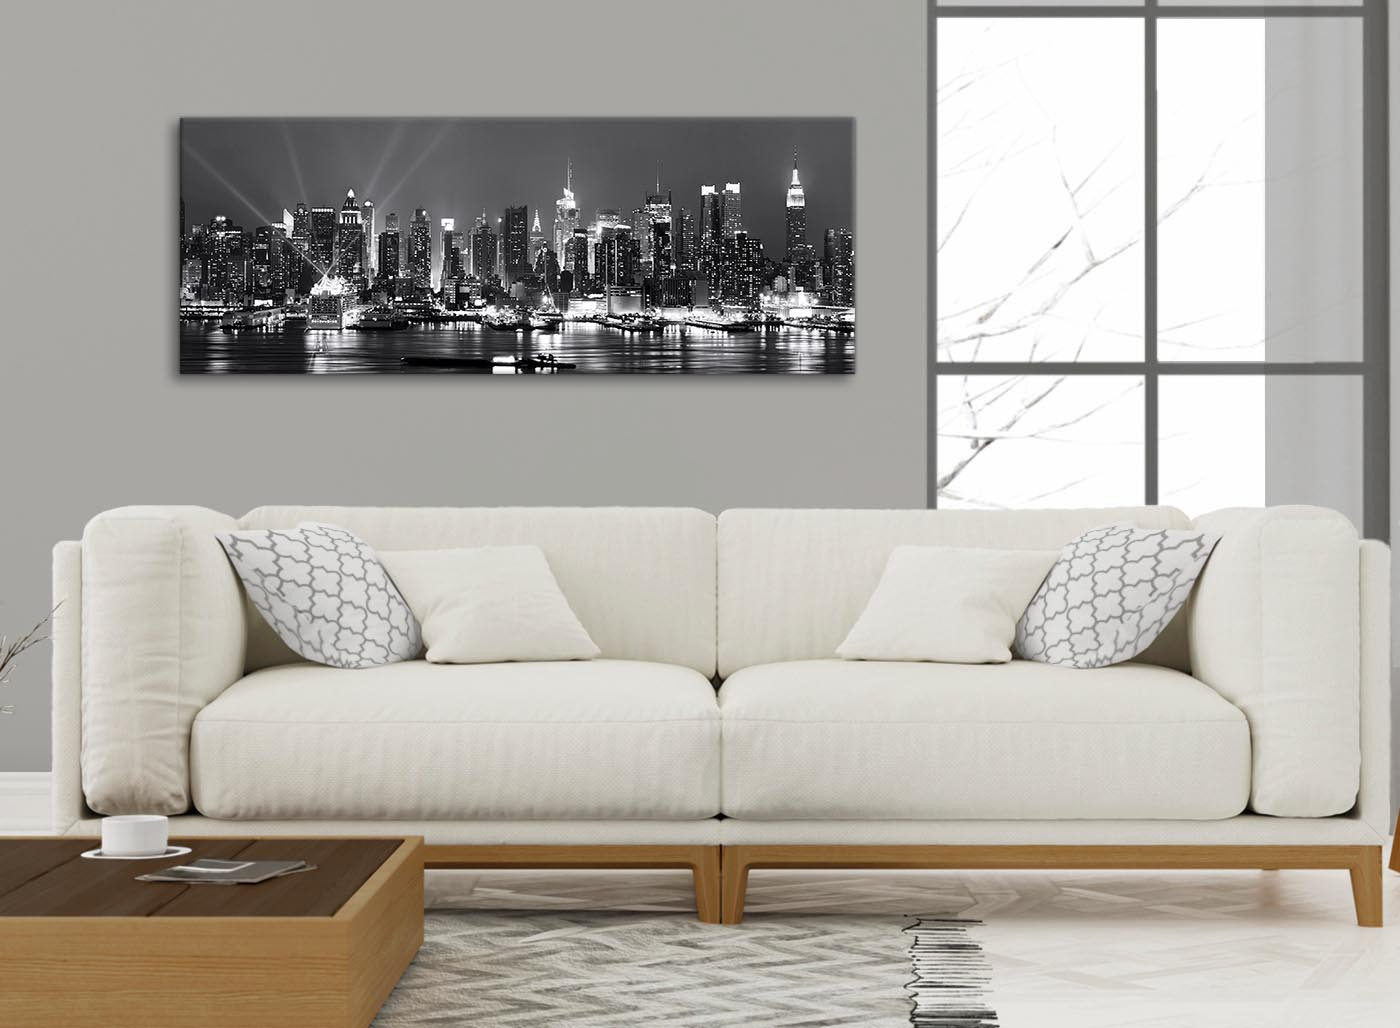 New York Hudson River Skyline Canvas Art Pictures Landscape Black White Grey